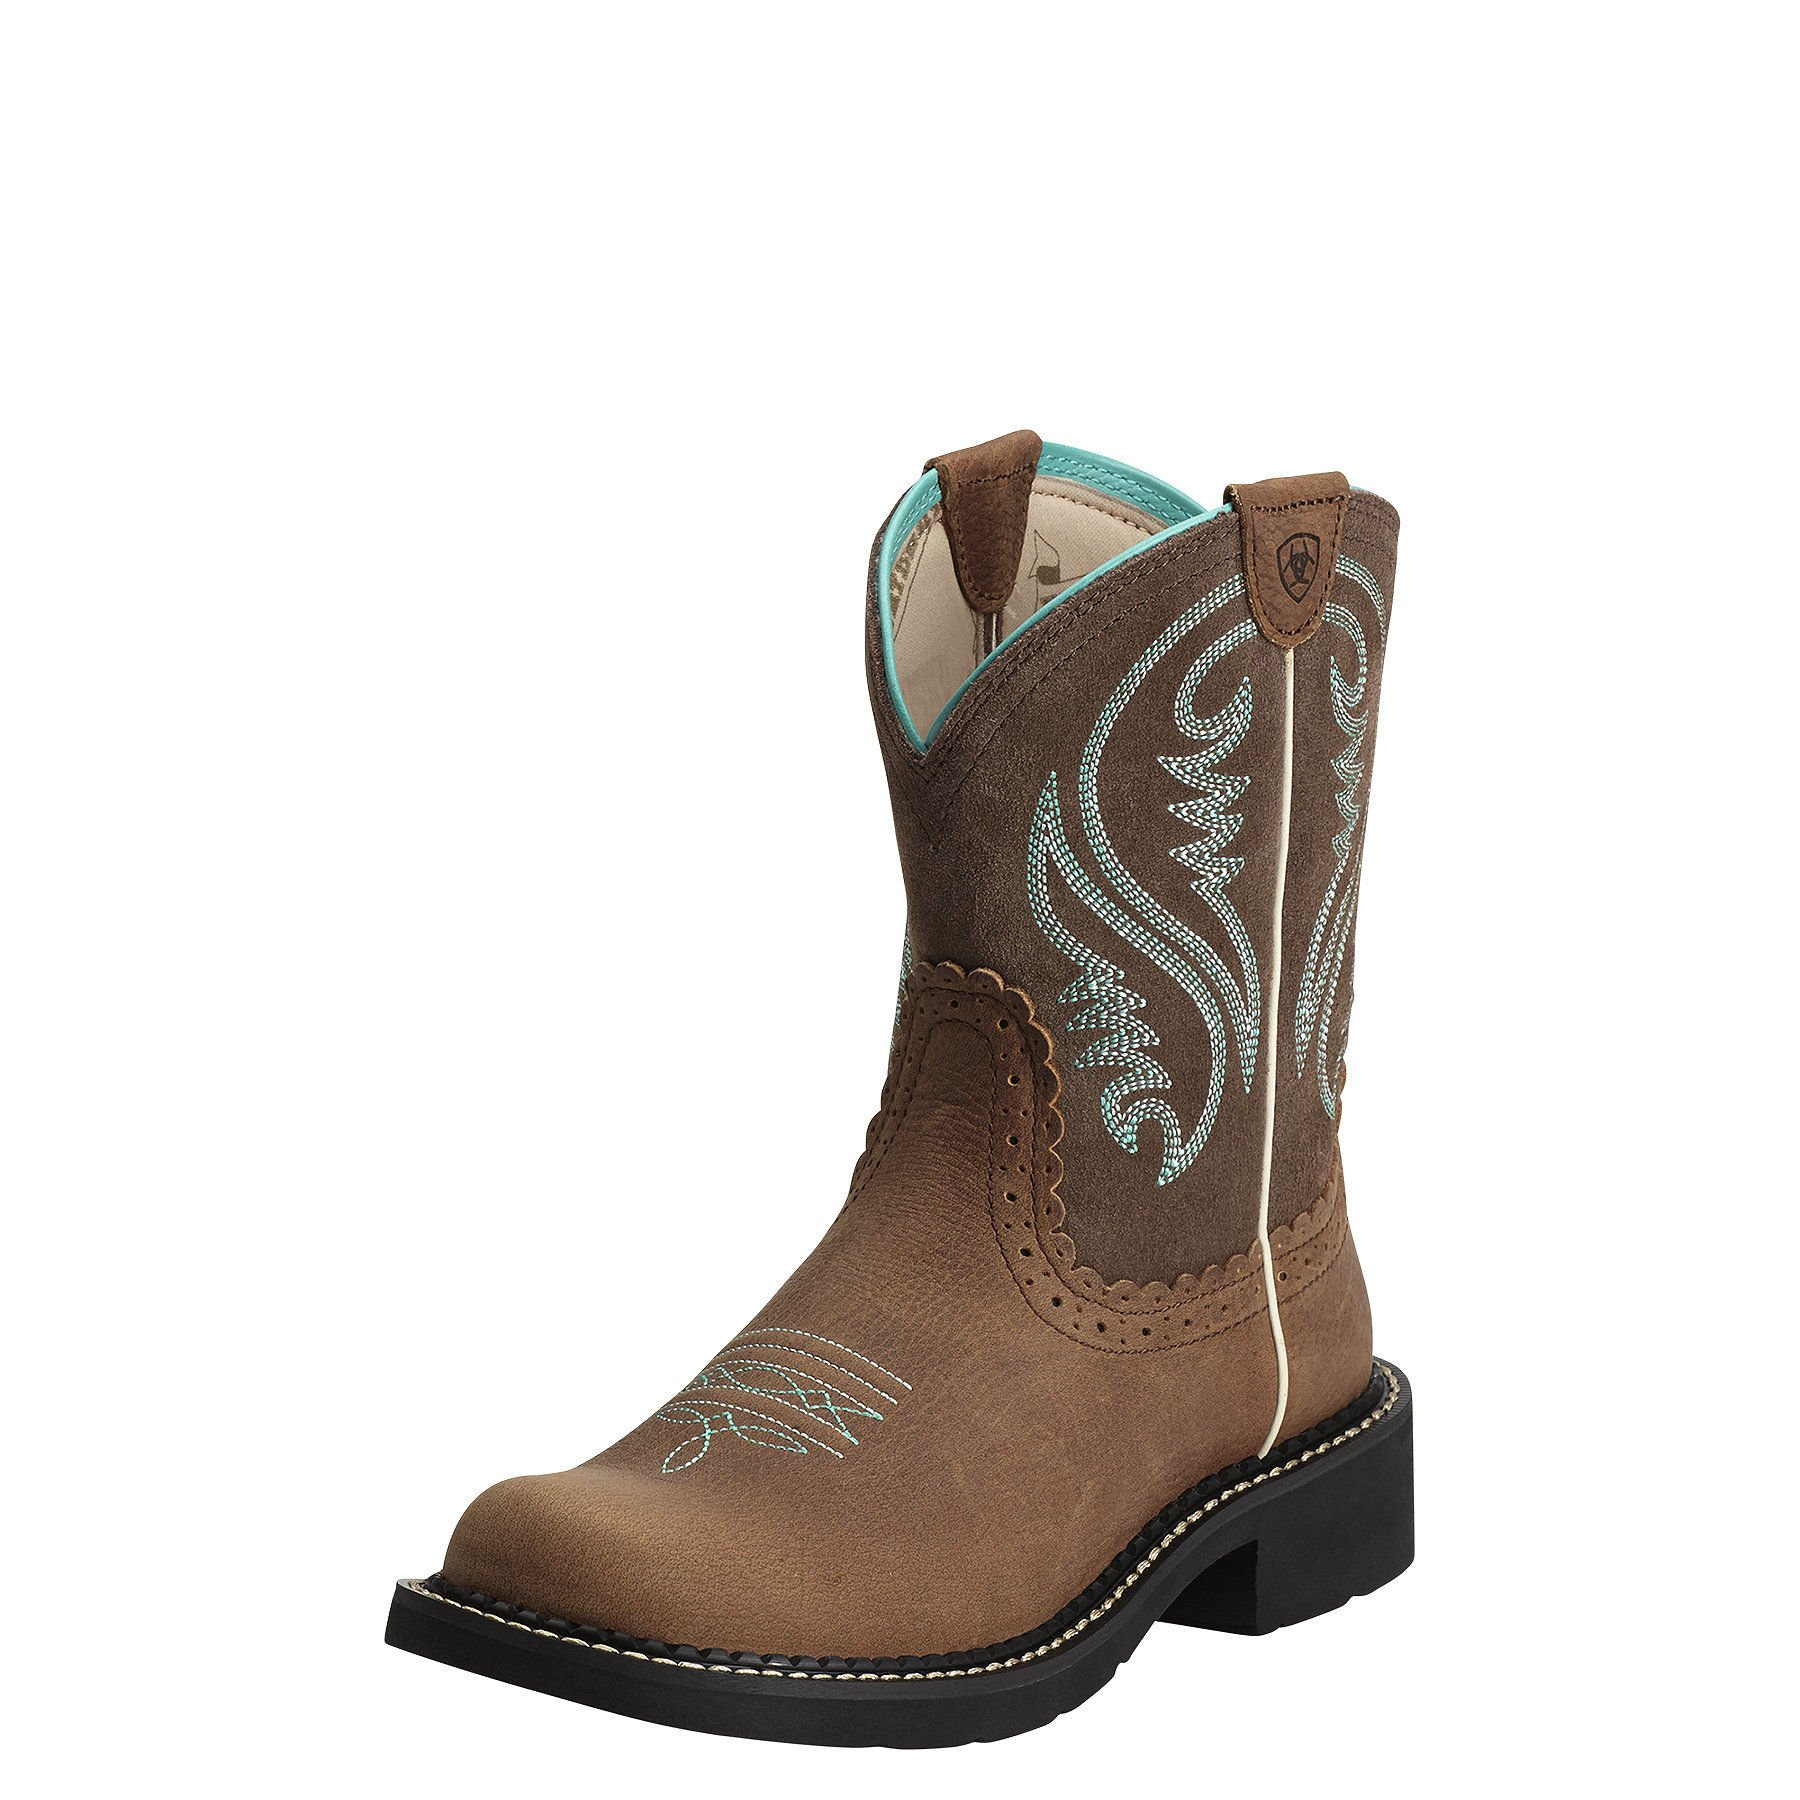 Ariat Women's Fatbaby Heritage Western Cowboy Boot, Tan Rowdy/Tan, 6.5 M US